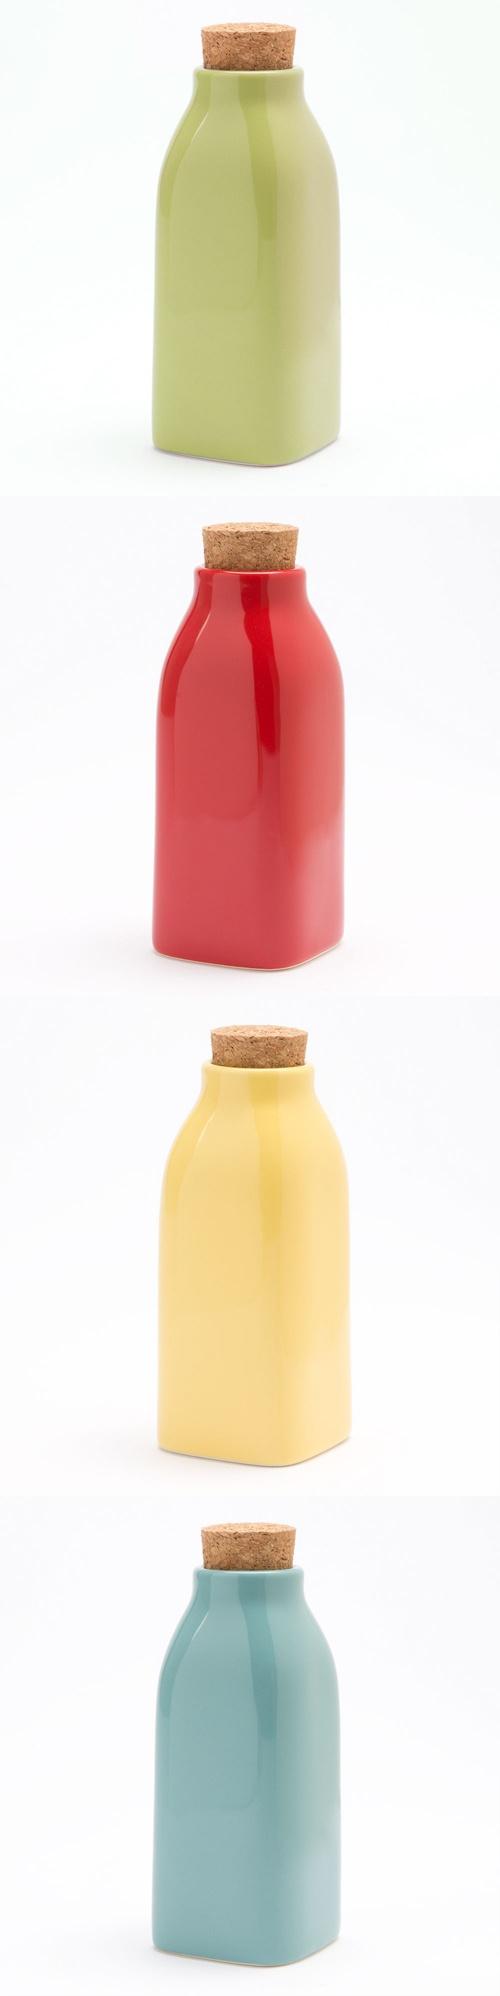 Milk storage just got an upgrade. #FoodNetwork #Kohls